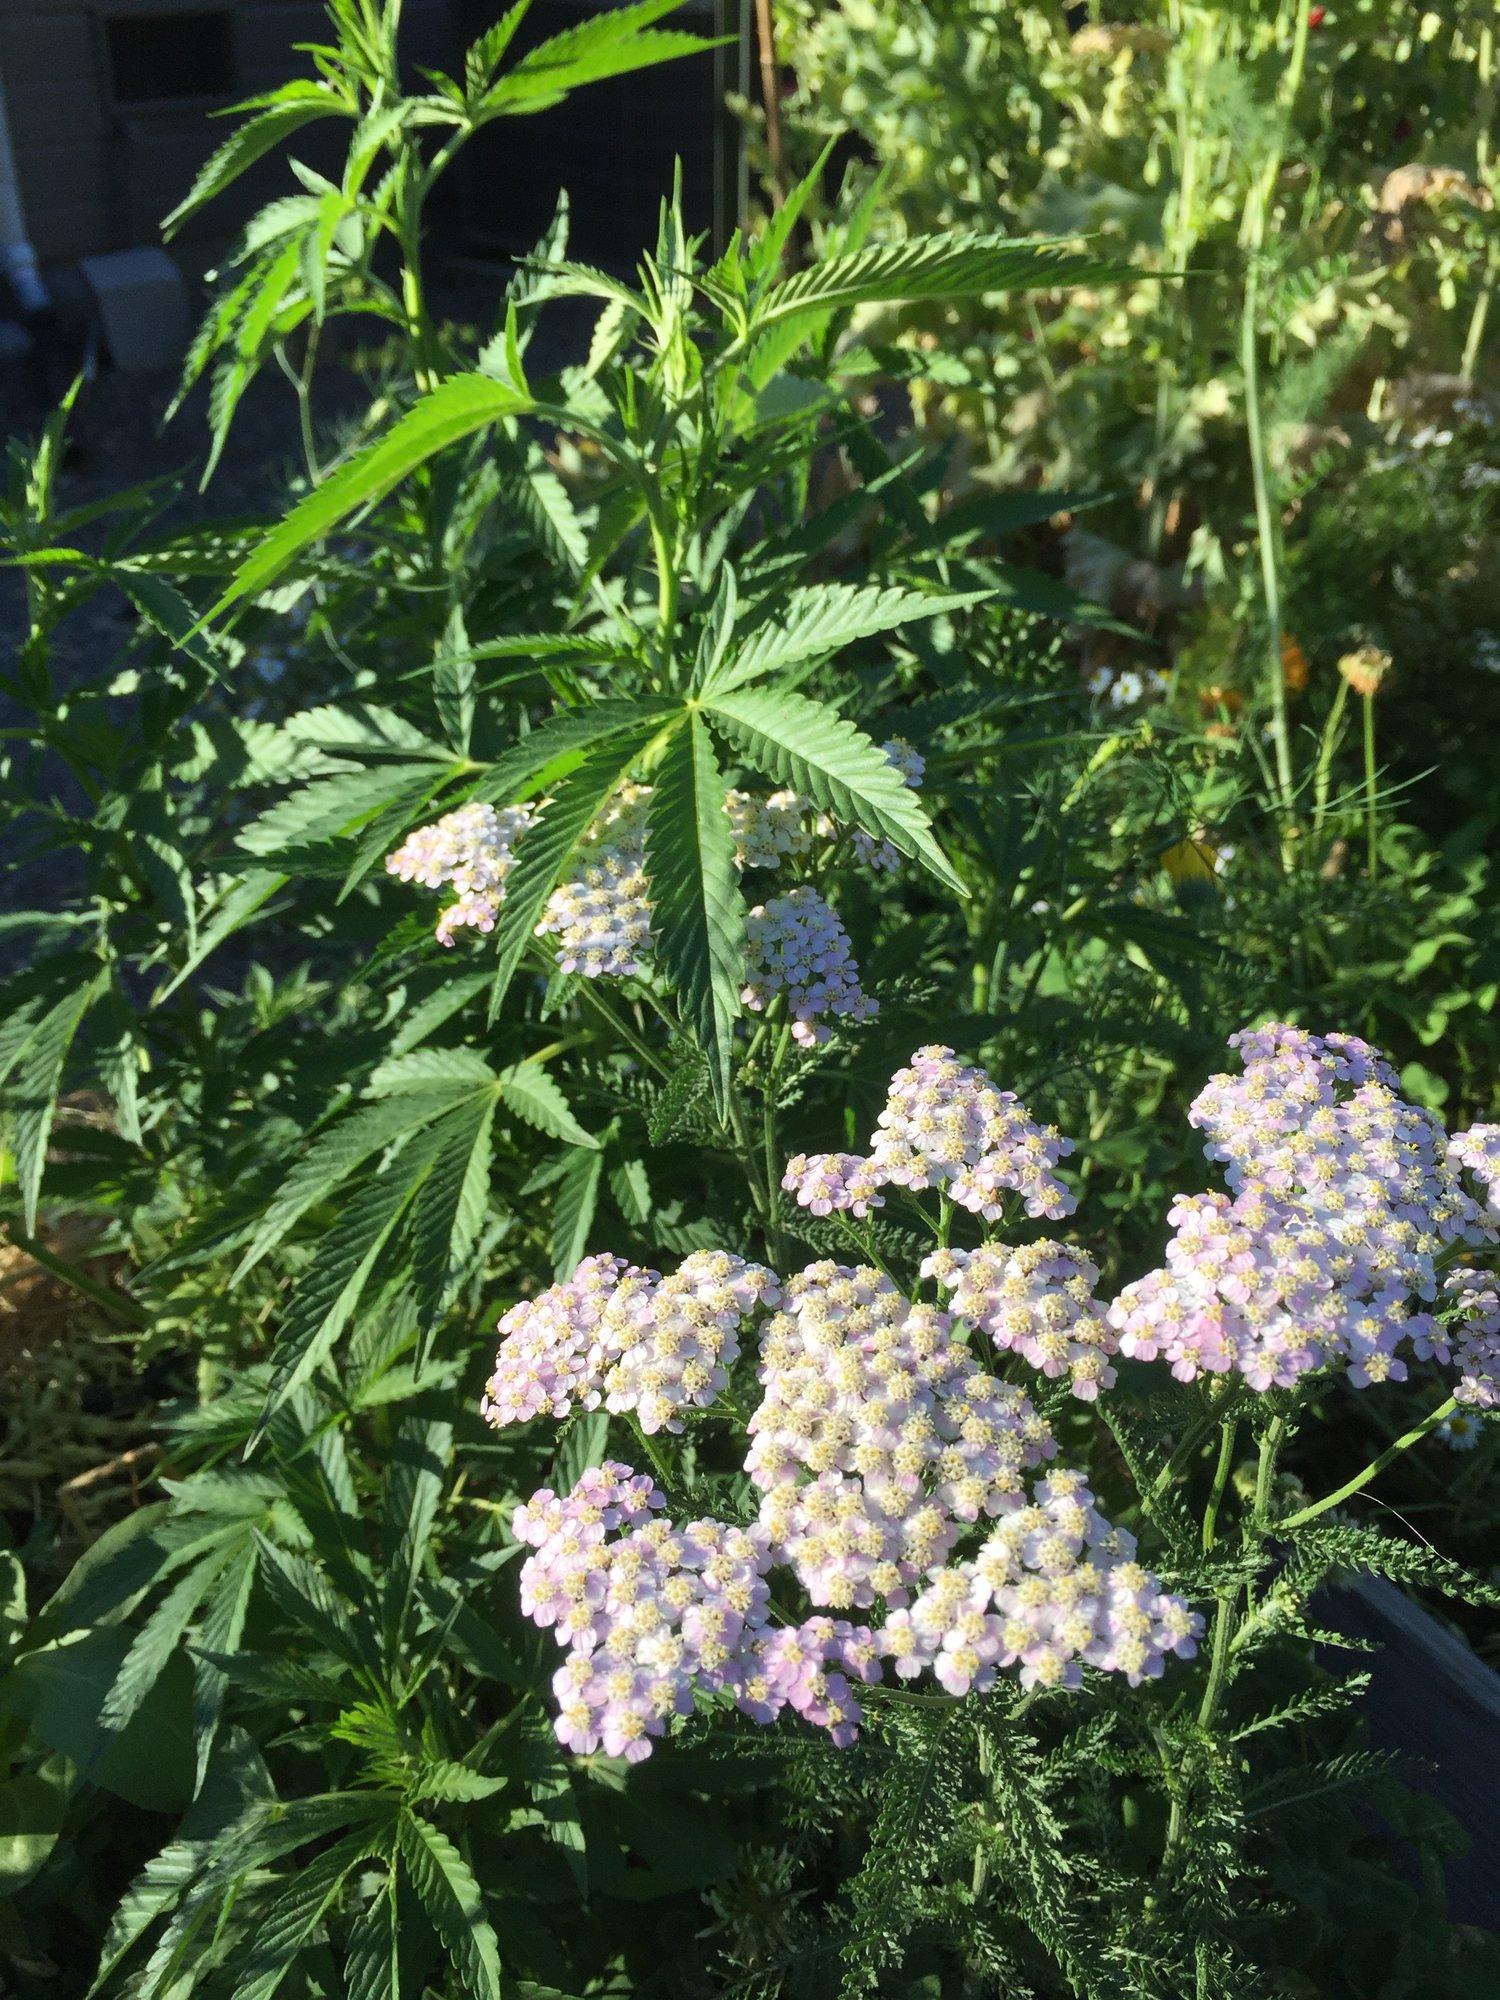 Cannabis Horticultural Association Cannabis Horticultural